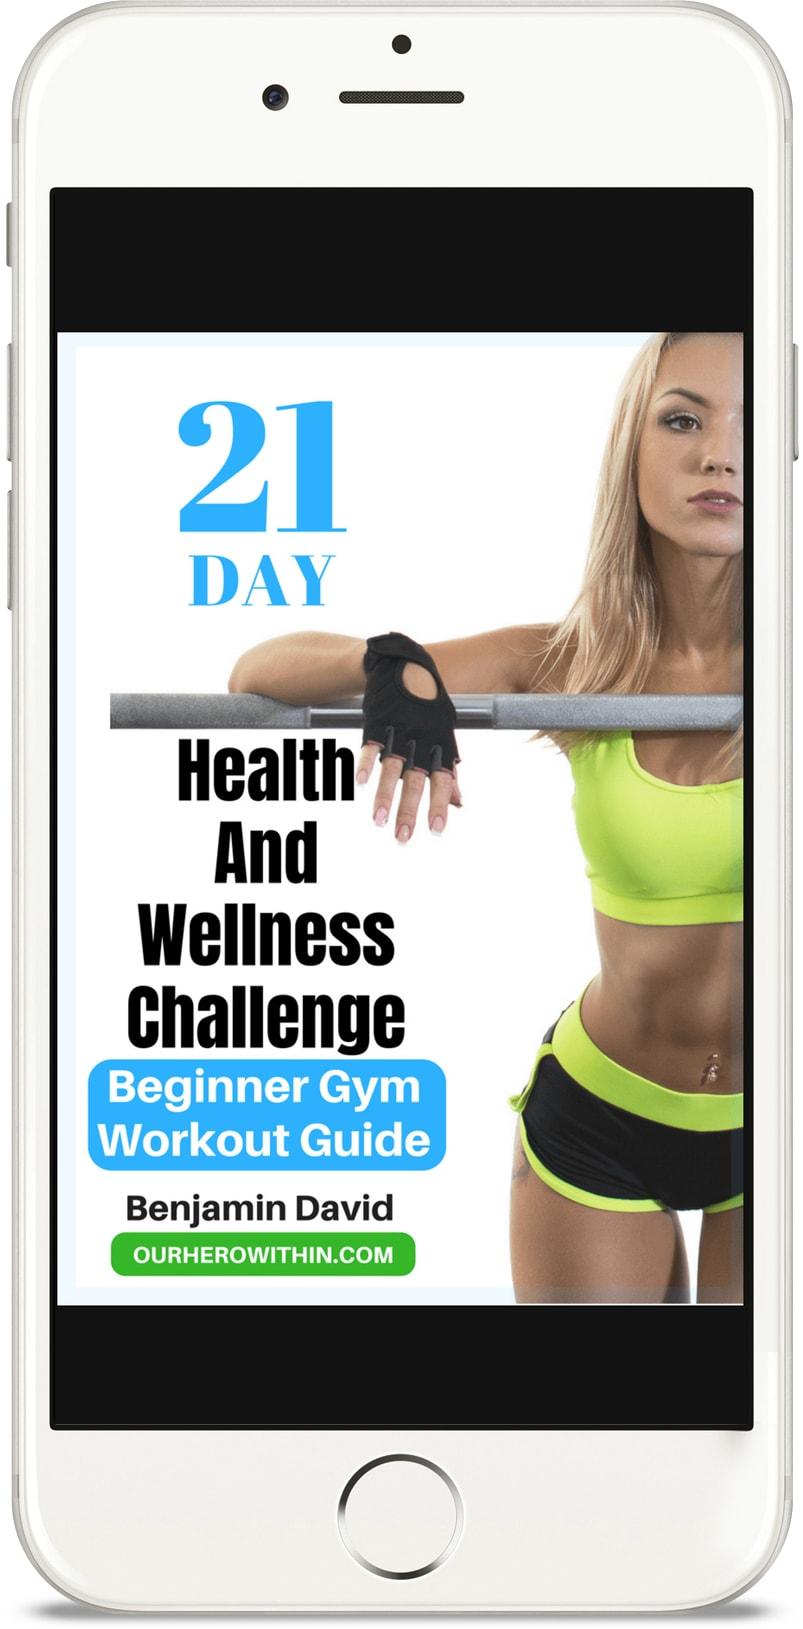 Beginner gym guide